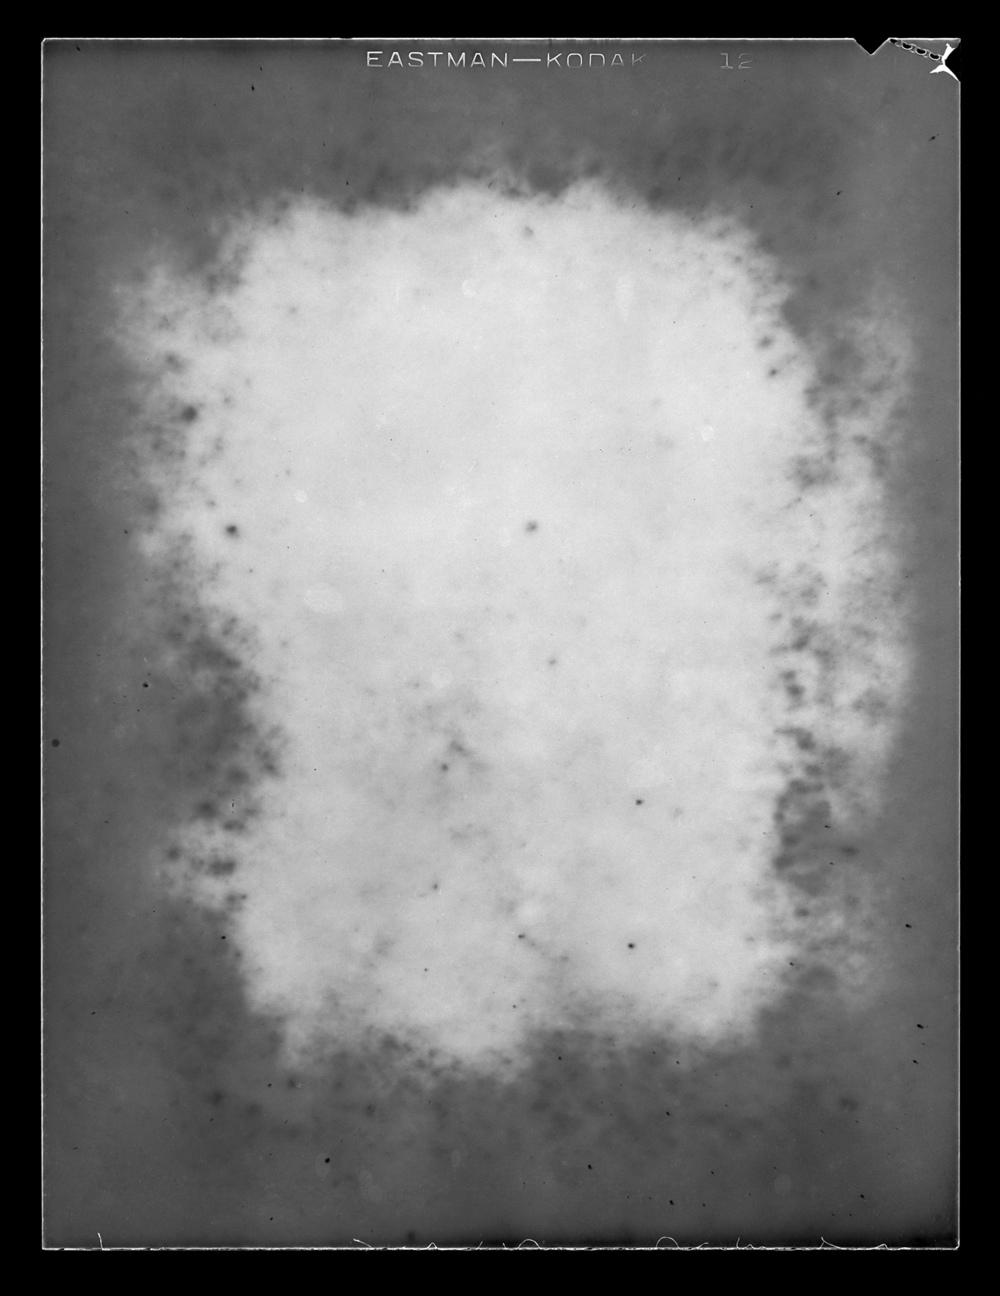 pan8.jpg